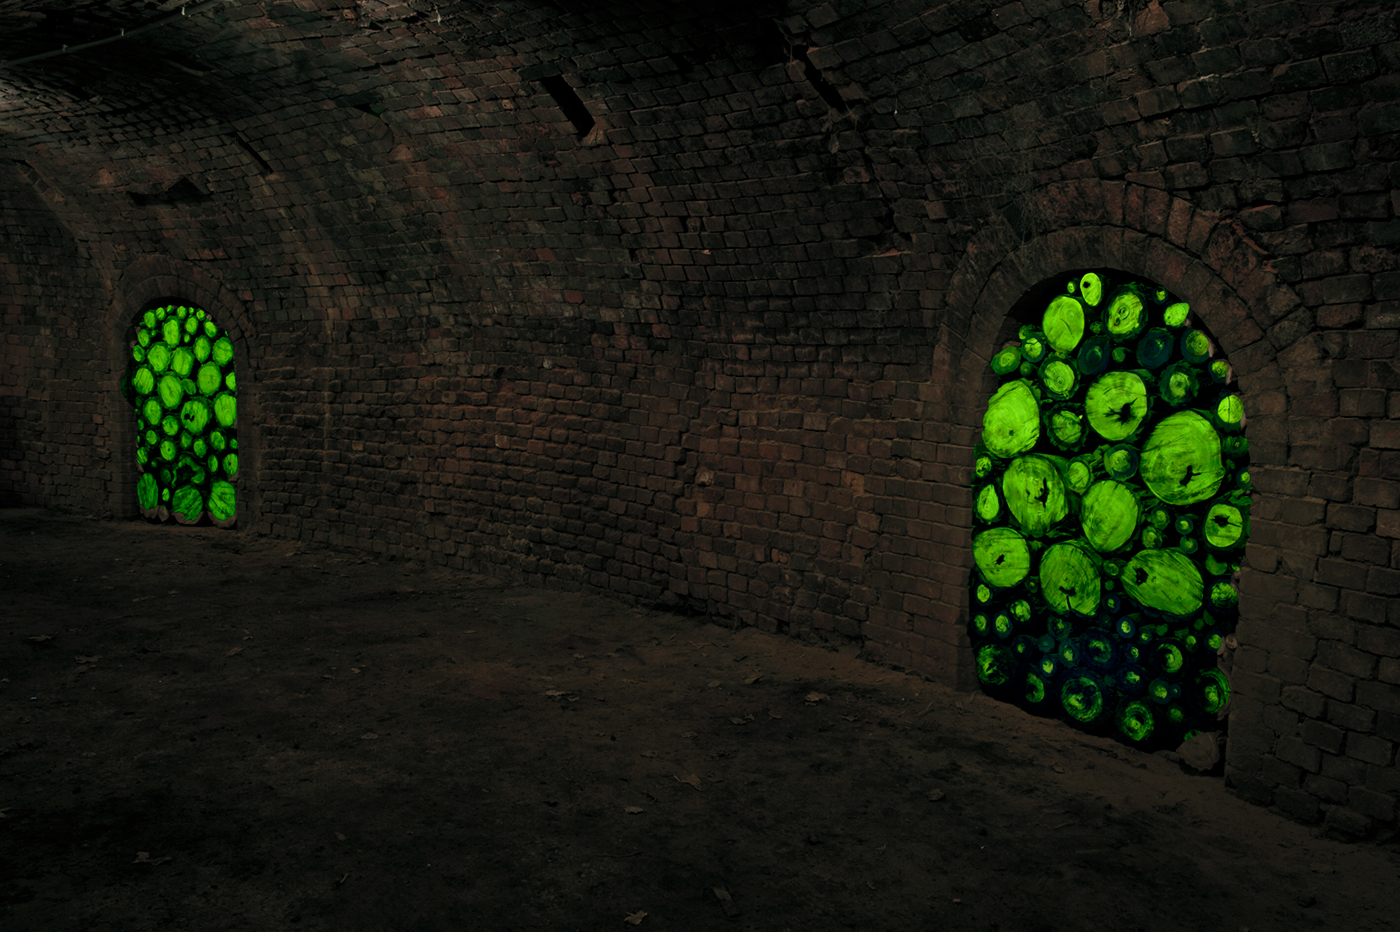 site-specific artinstallation rauminstallation art artist Installationskünstler light art black light Lichtkunst luce di wood Johannes Pfeiffer